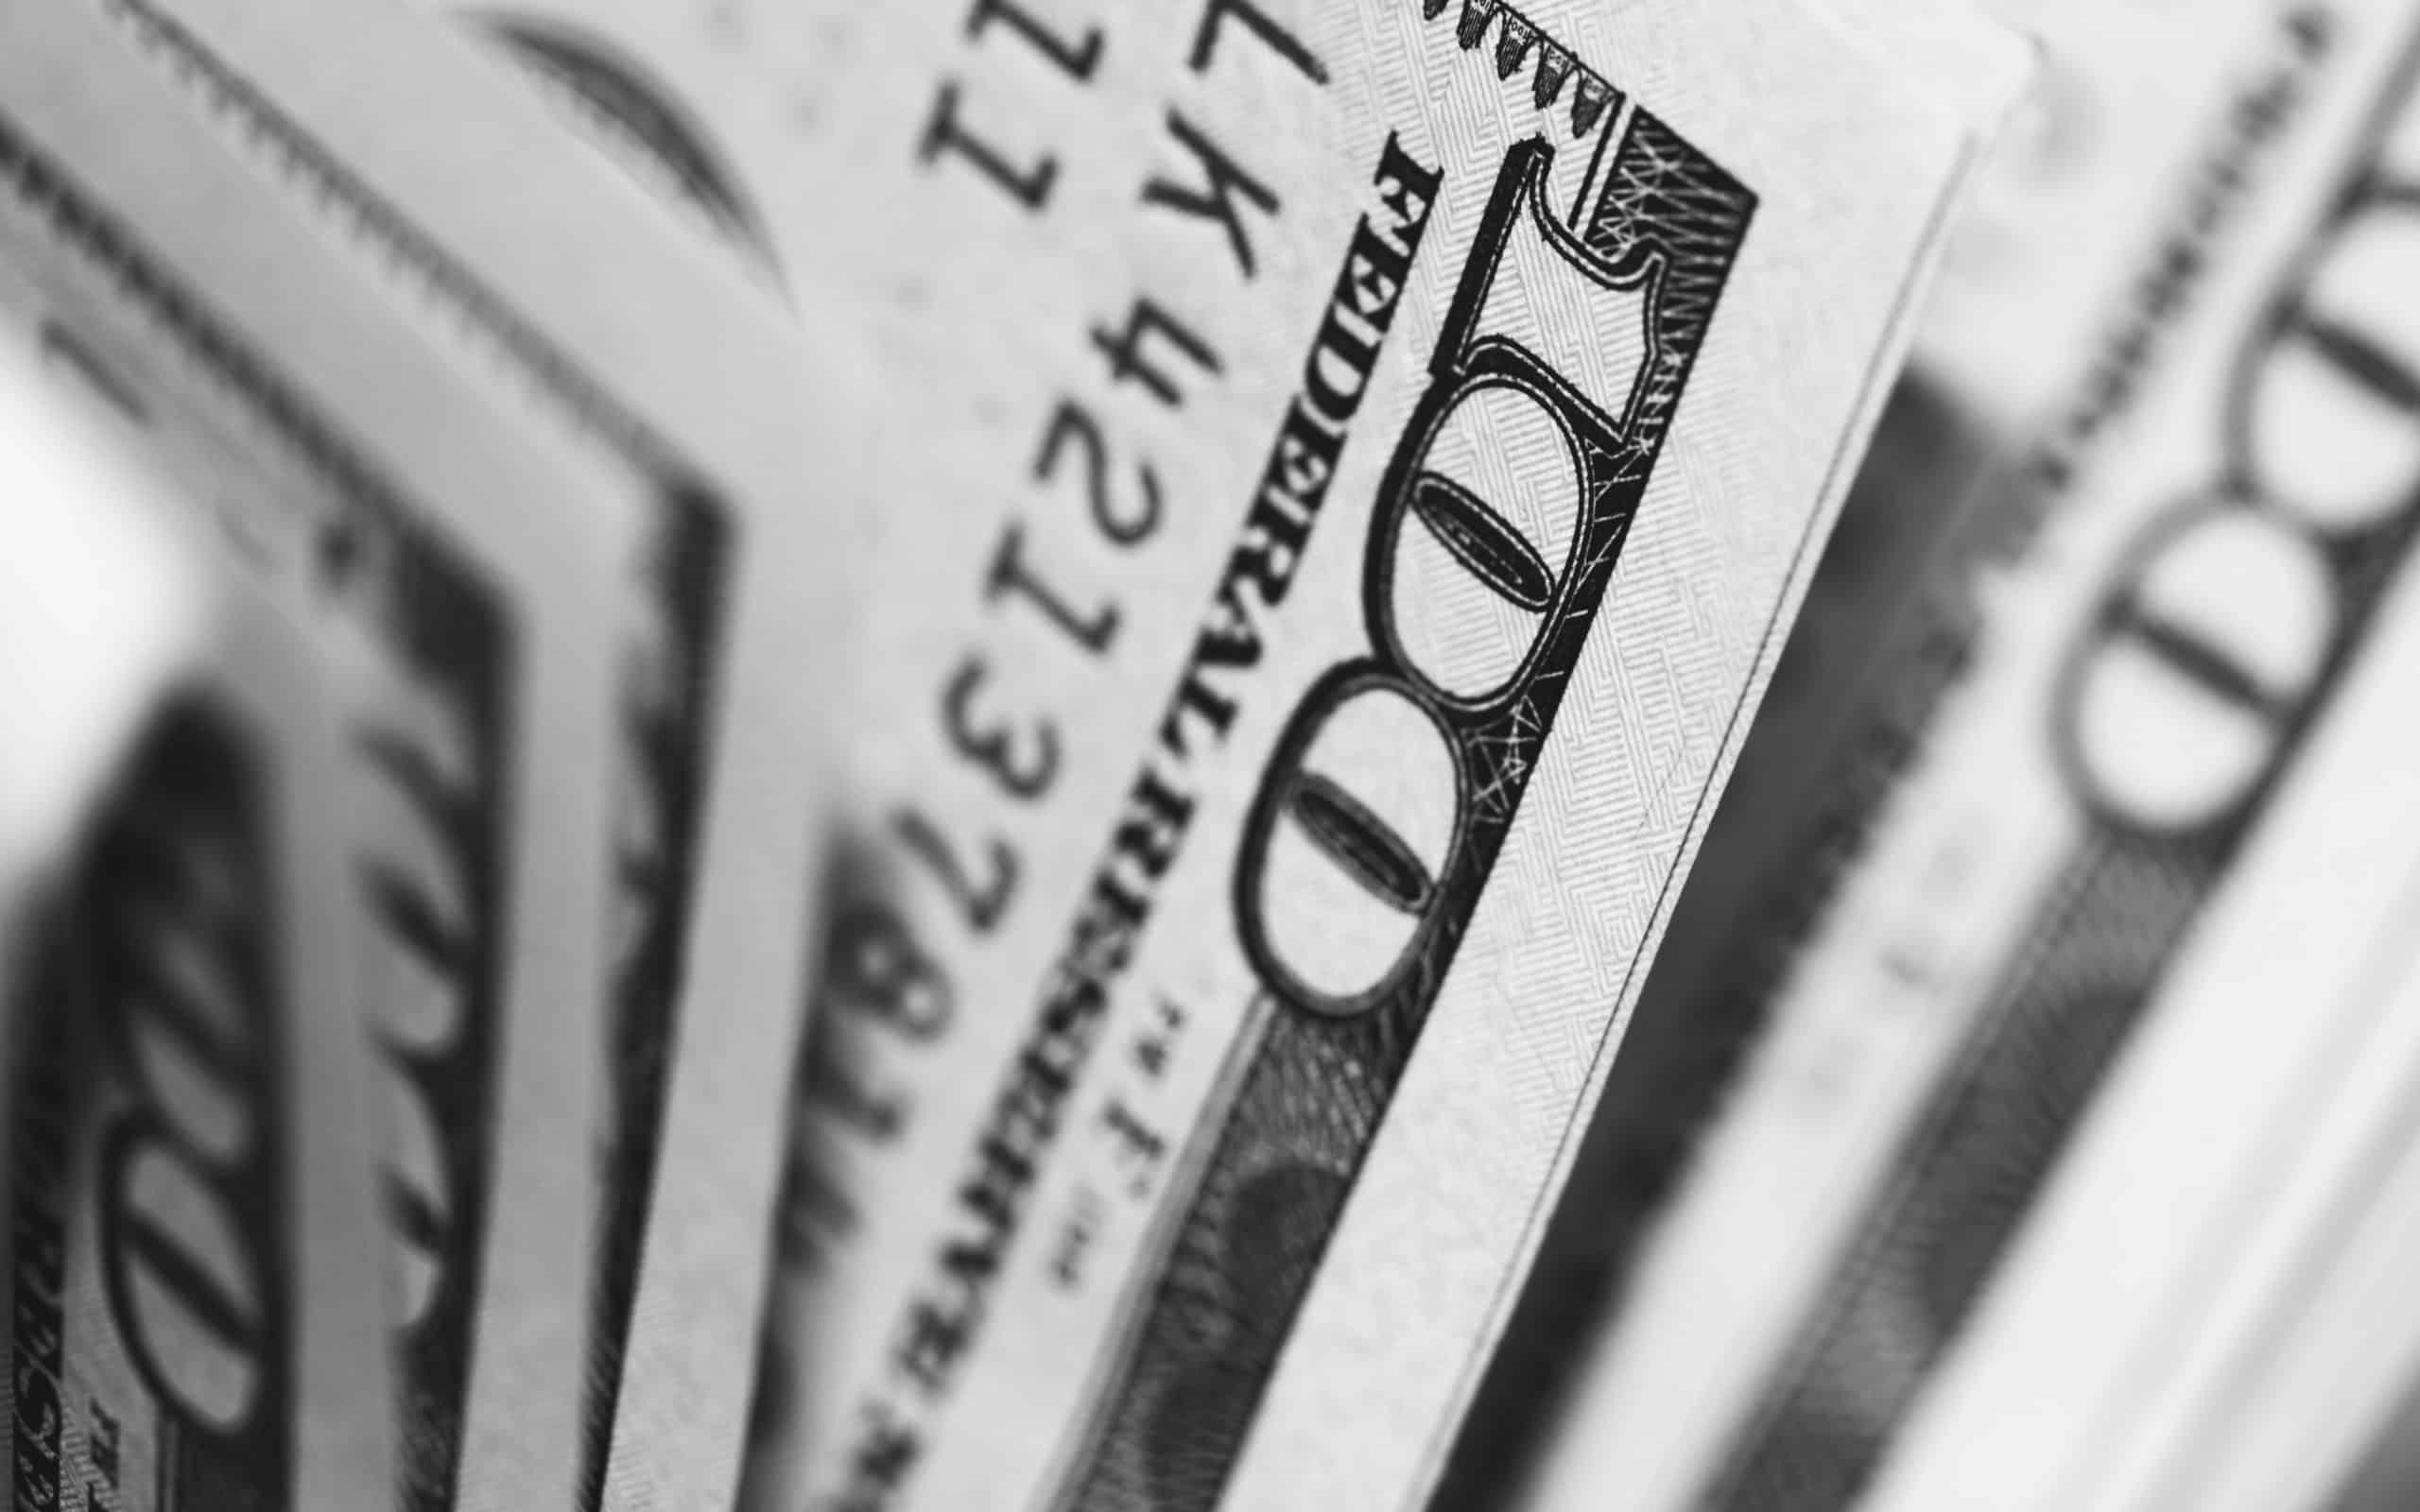 aksjeselskap egenkapital